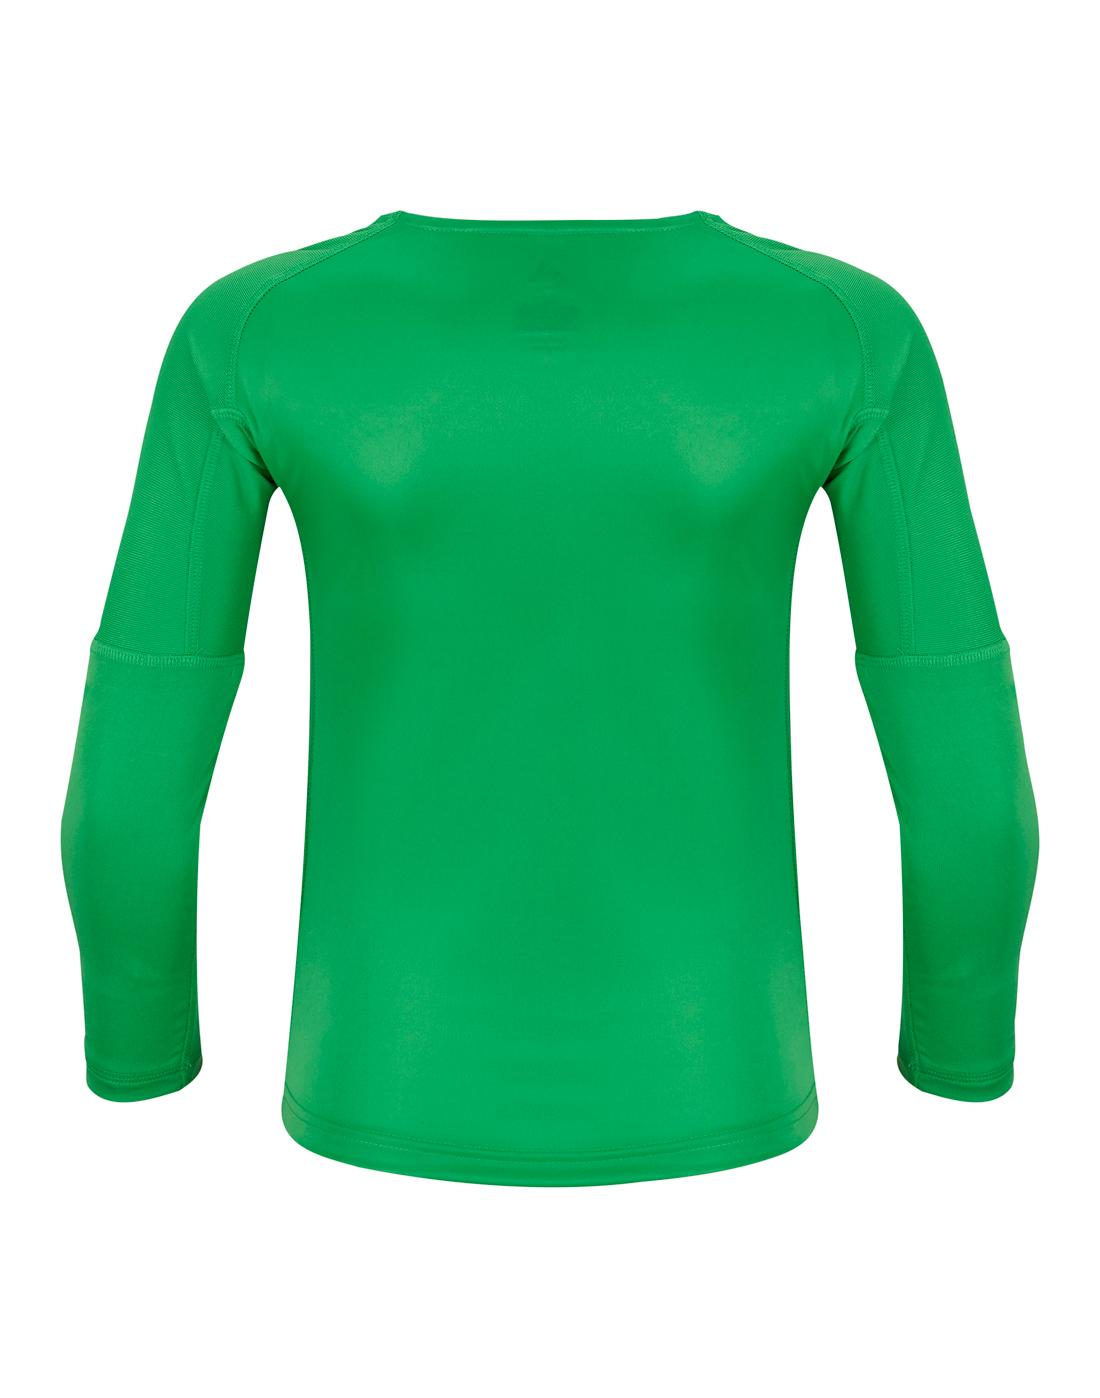 09150fb3d7b adidas Kids Man Utd 17 18 G Keeper Away Jersey